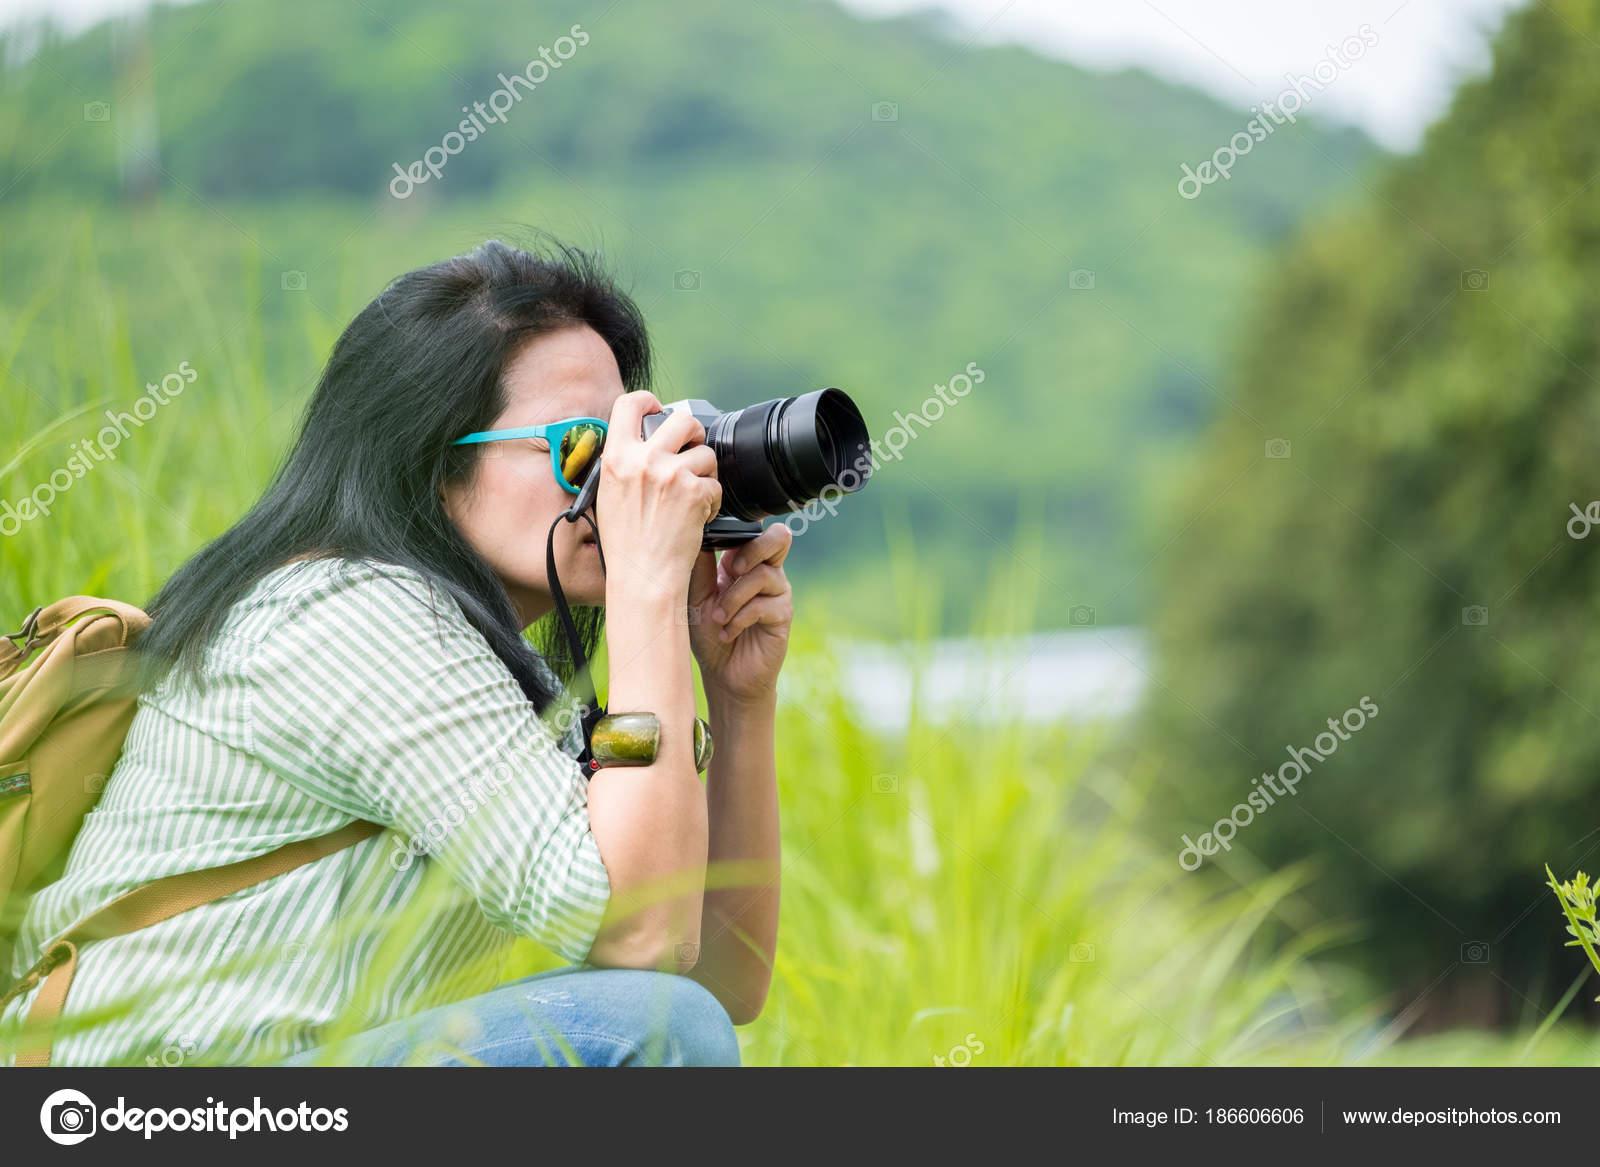 Woman Photographer Wear Sunglasses Holding Camera Take